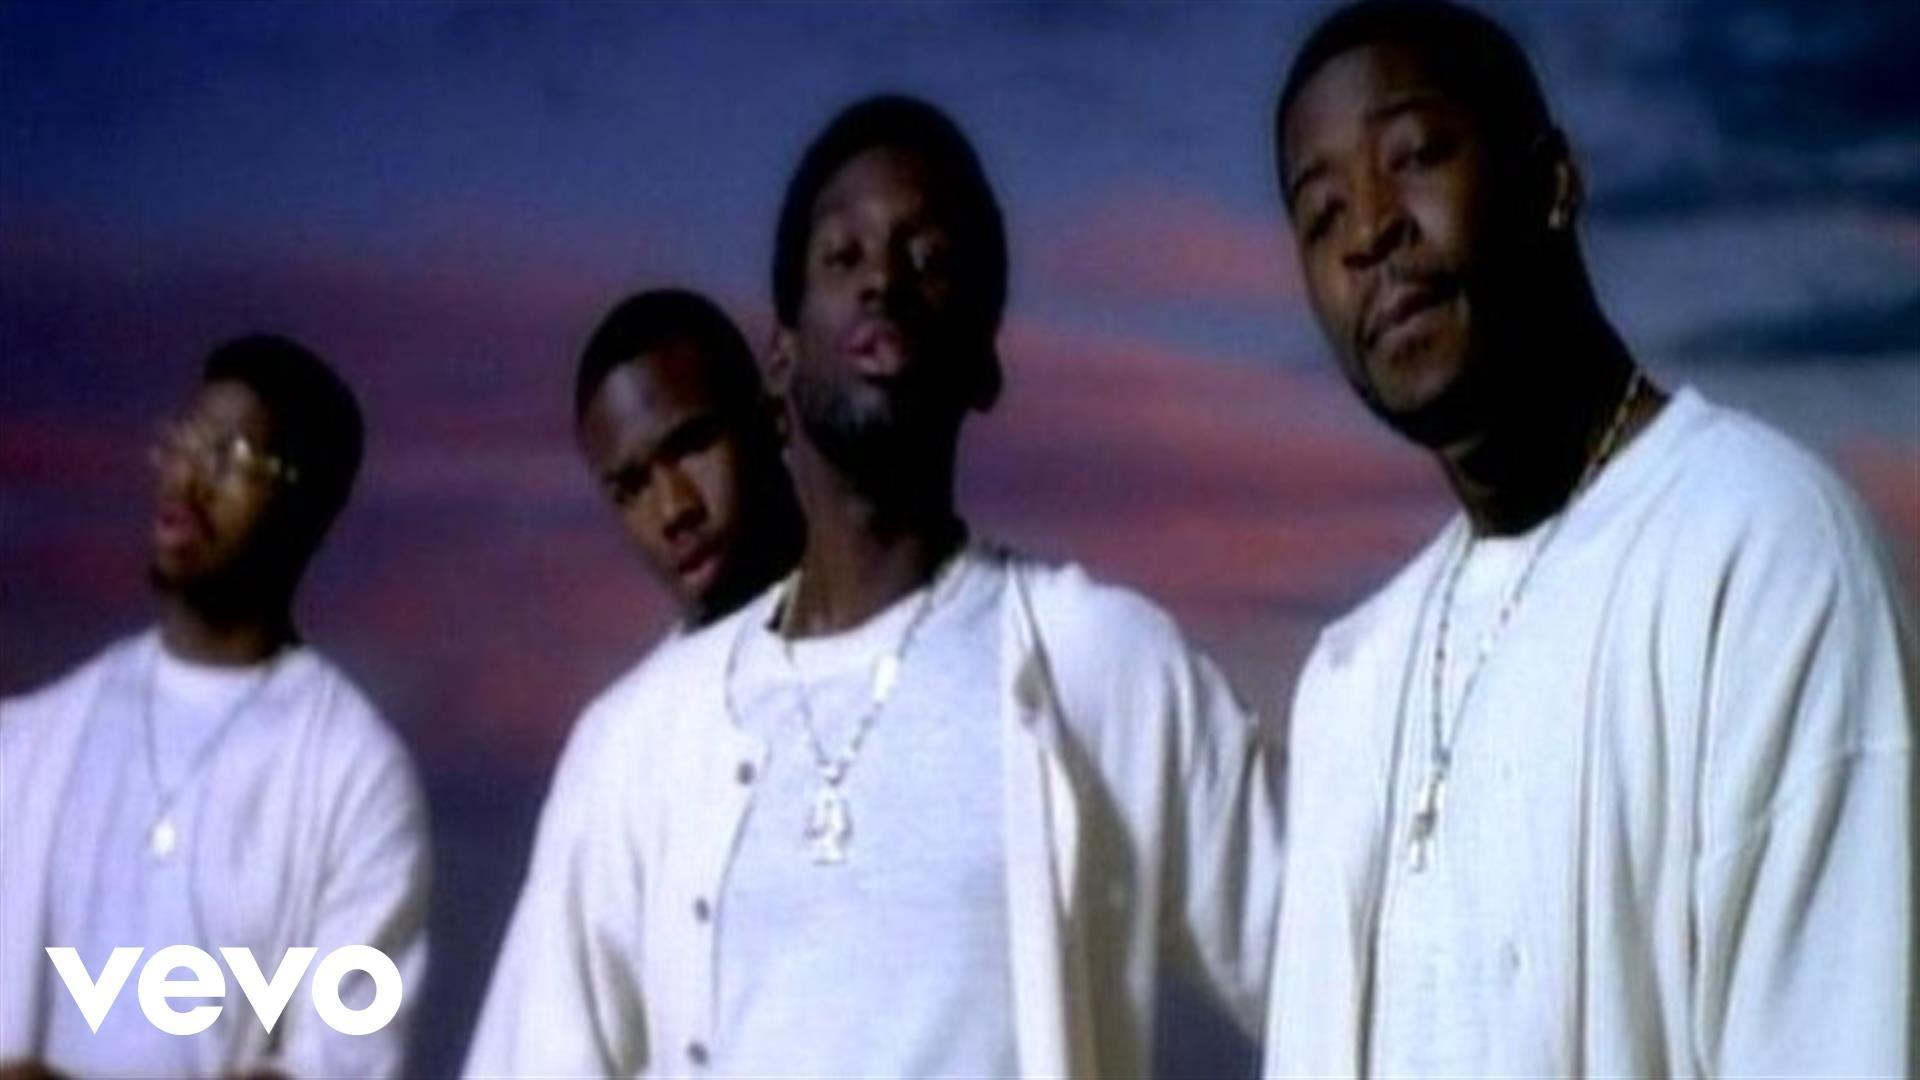 Boyz II Men - Water Runs Dry - YouTube